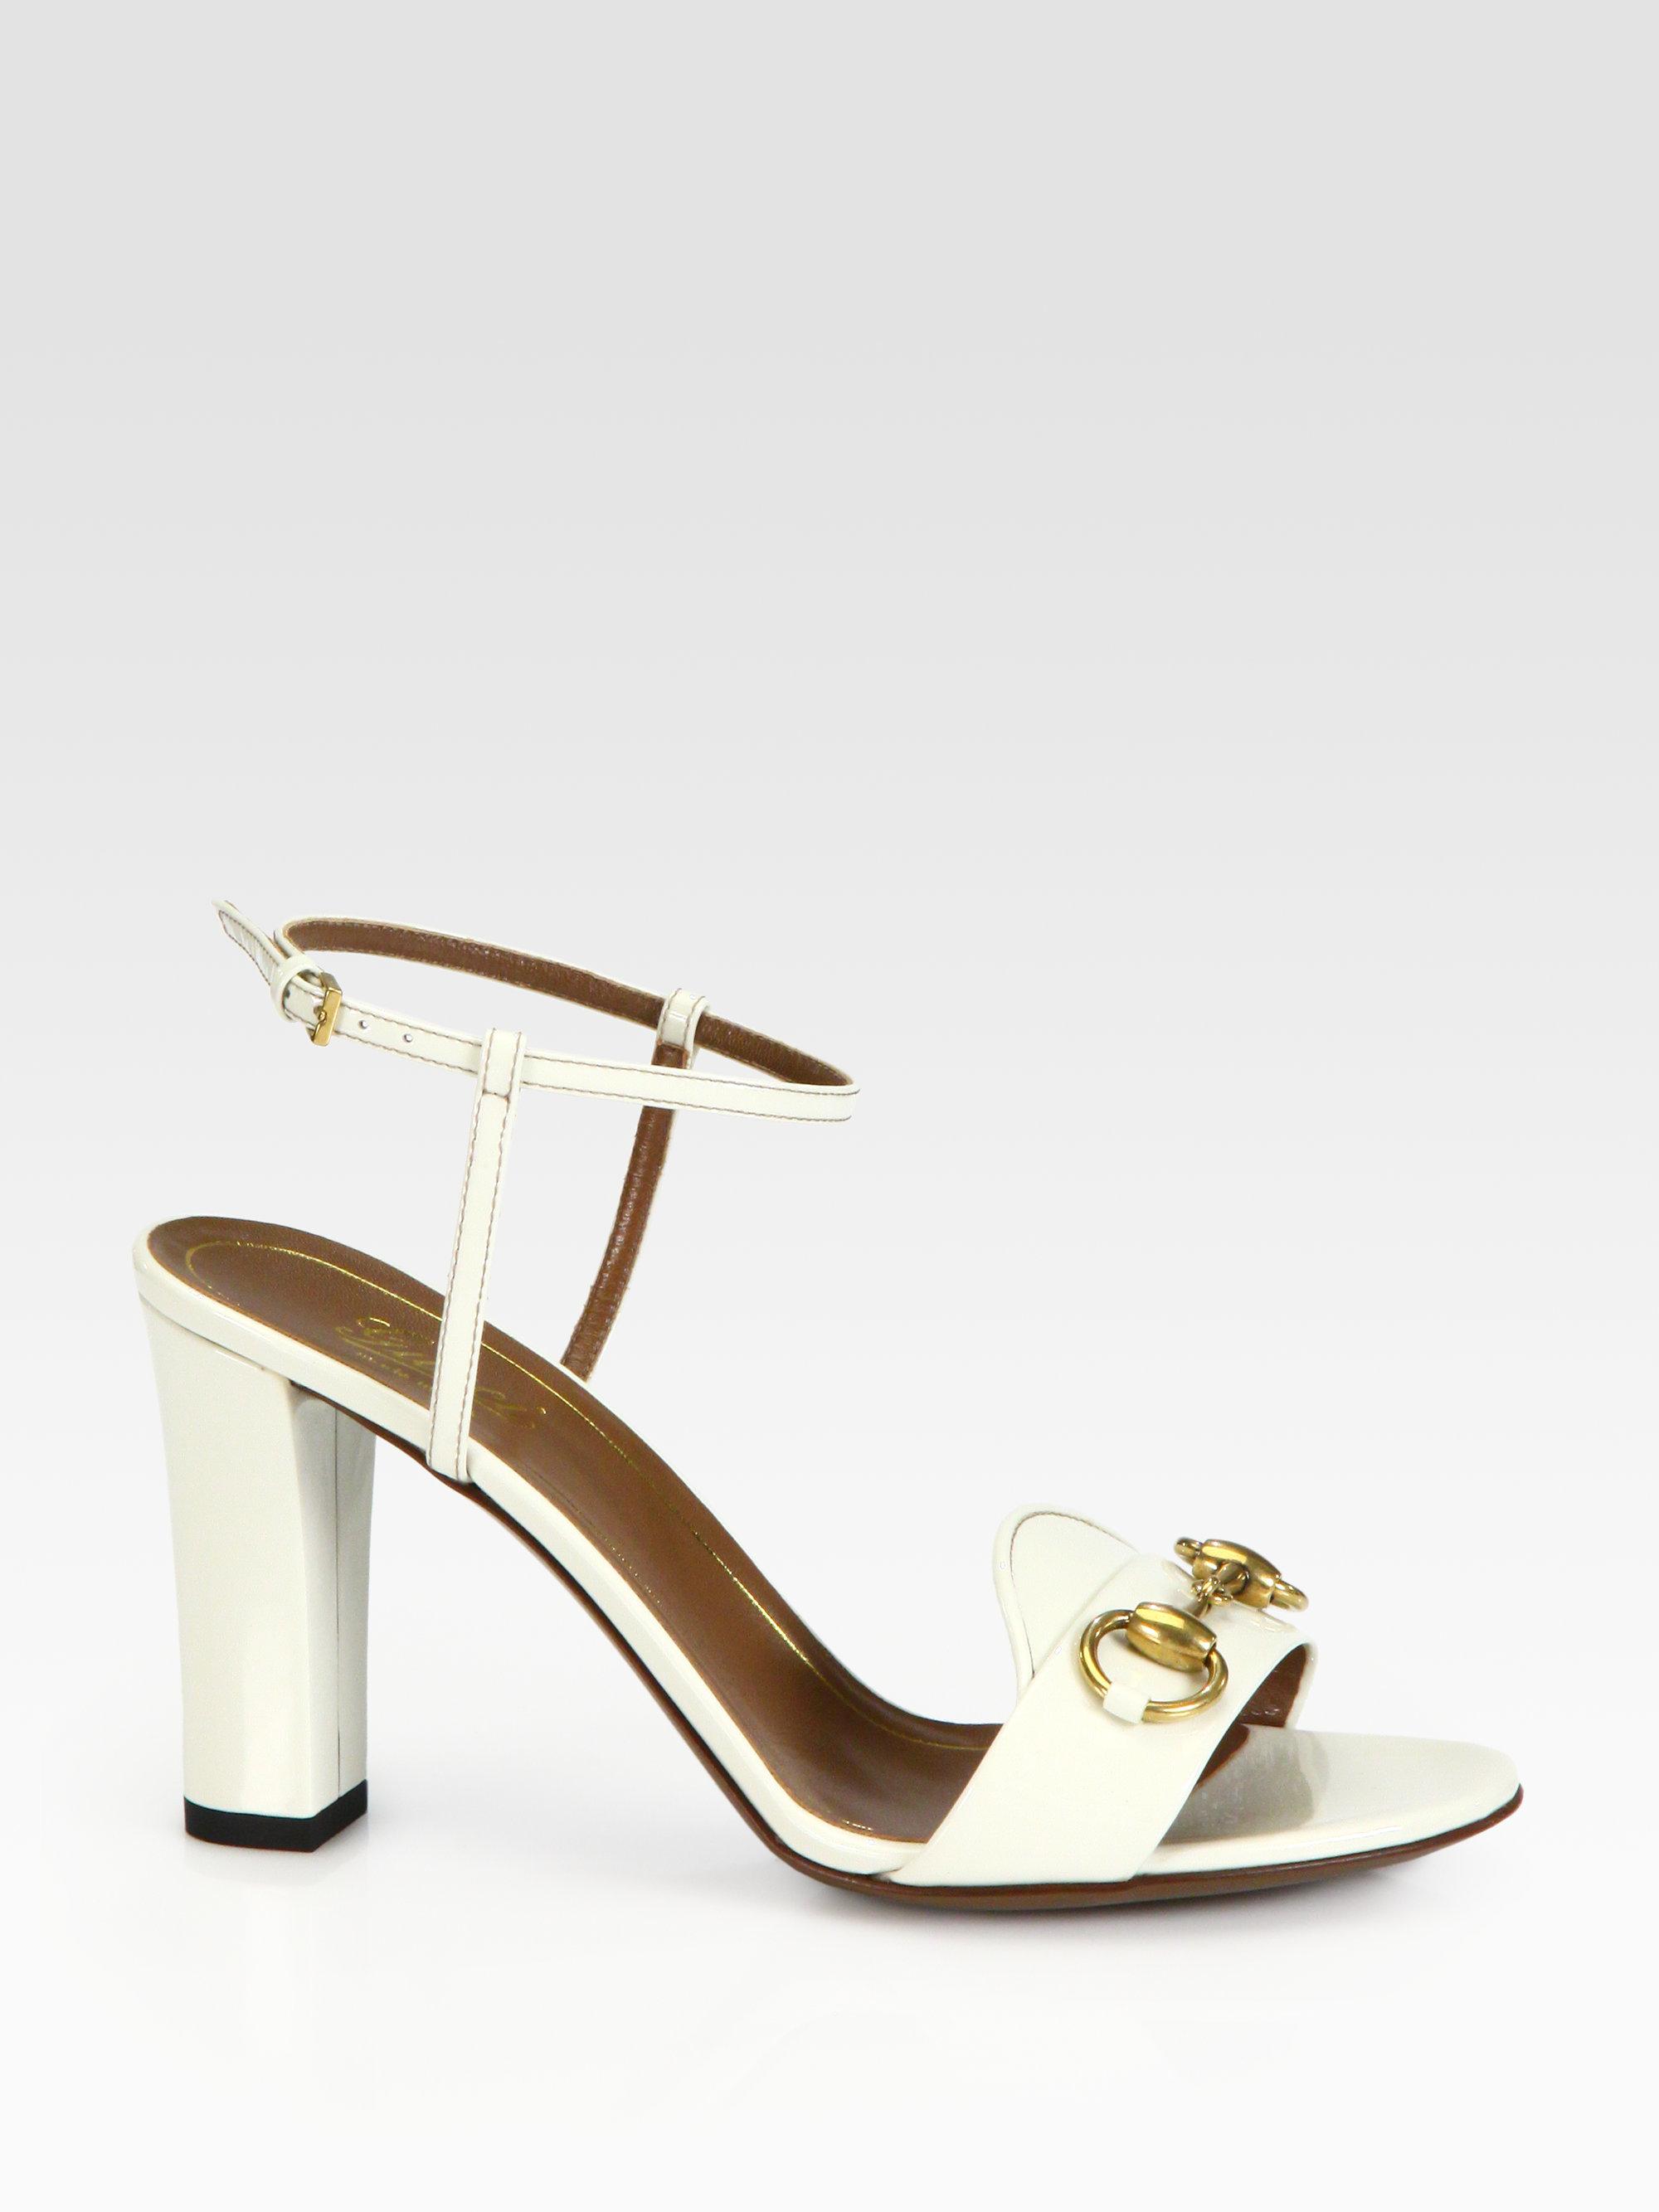 2de23f0e425c Lyst - Gucci Patent Leather Horsebit Sandals in White